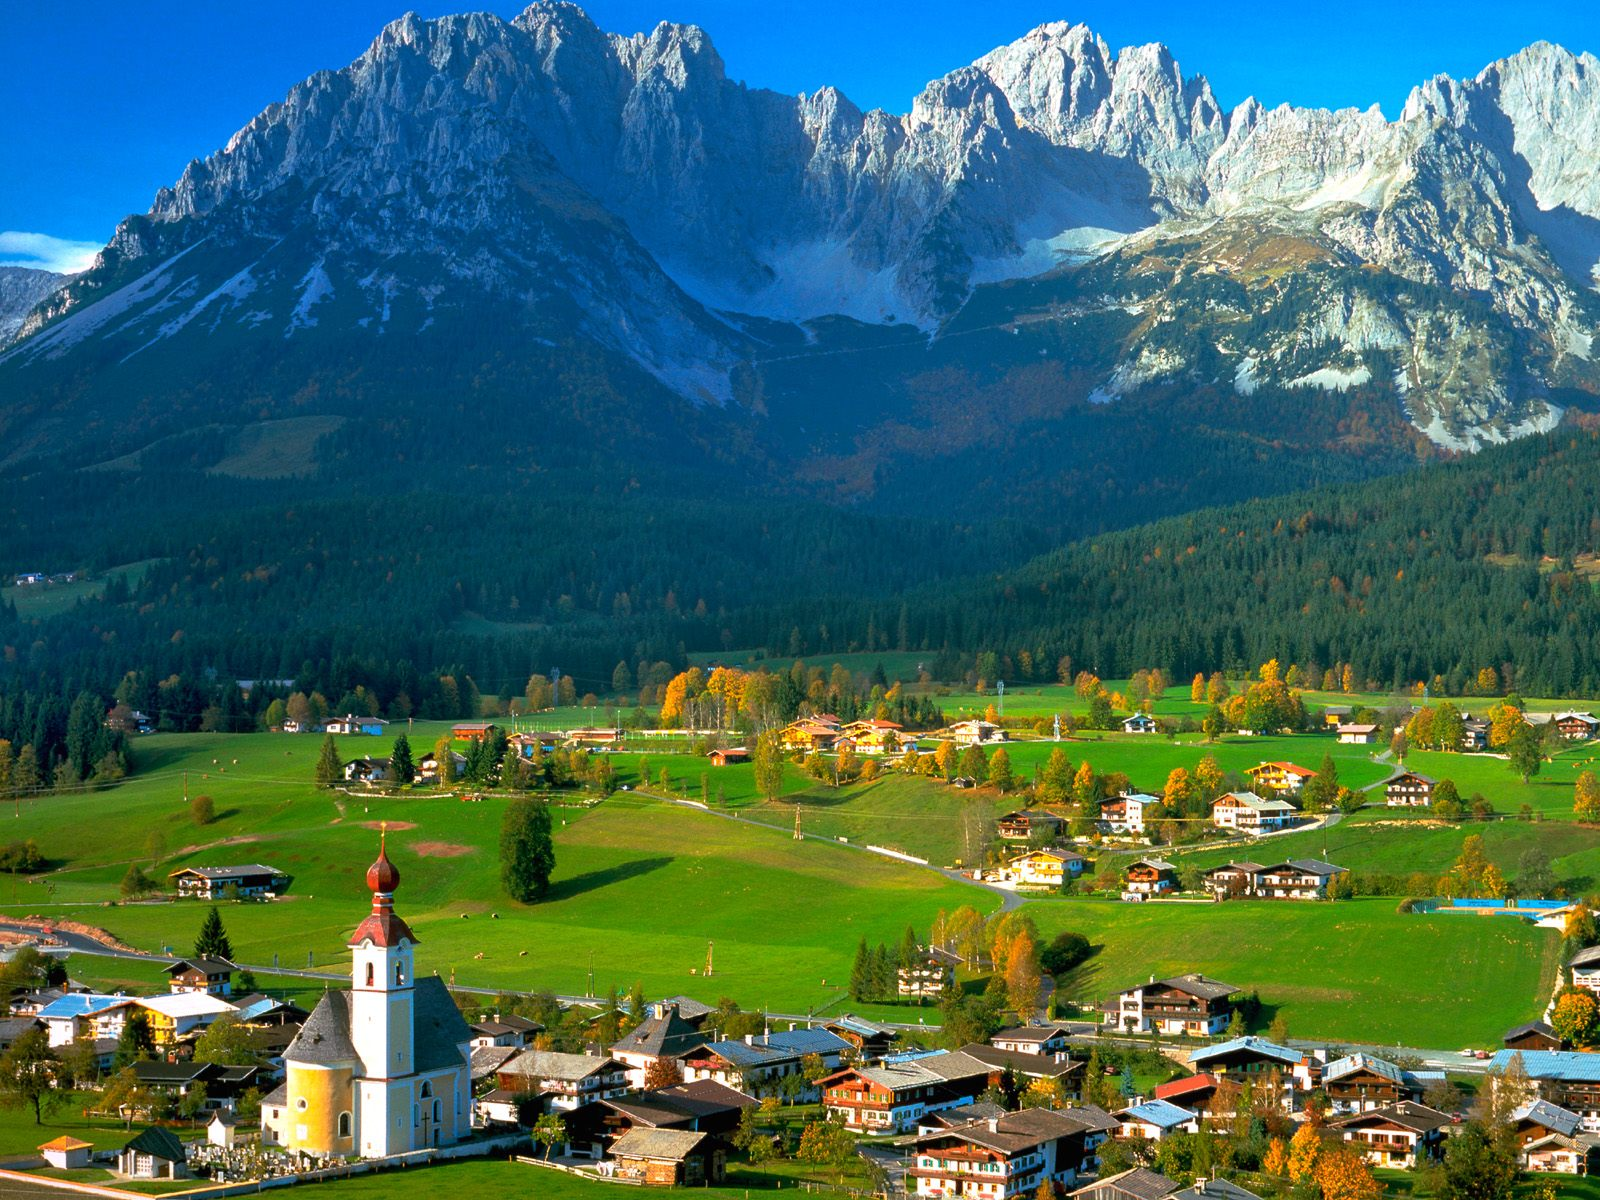 http://4.bp.blogspot.com/_FoTGw55CMx8/TTwxkFFFScI/AAAAAAAACk8/iuTpbyxkP4o/s1600/Tyrol%252C%2BAustria.jpg